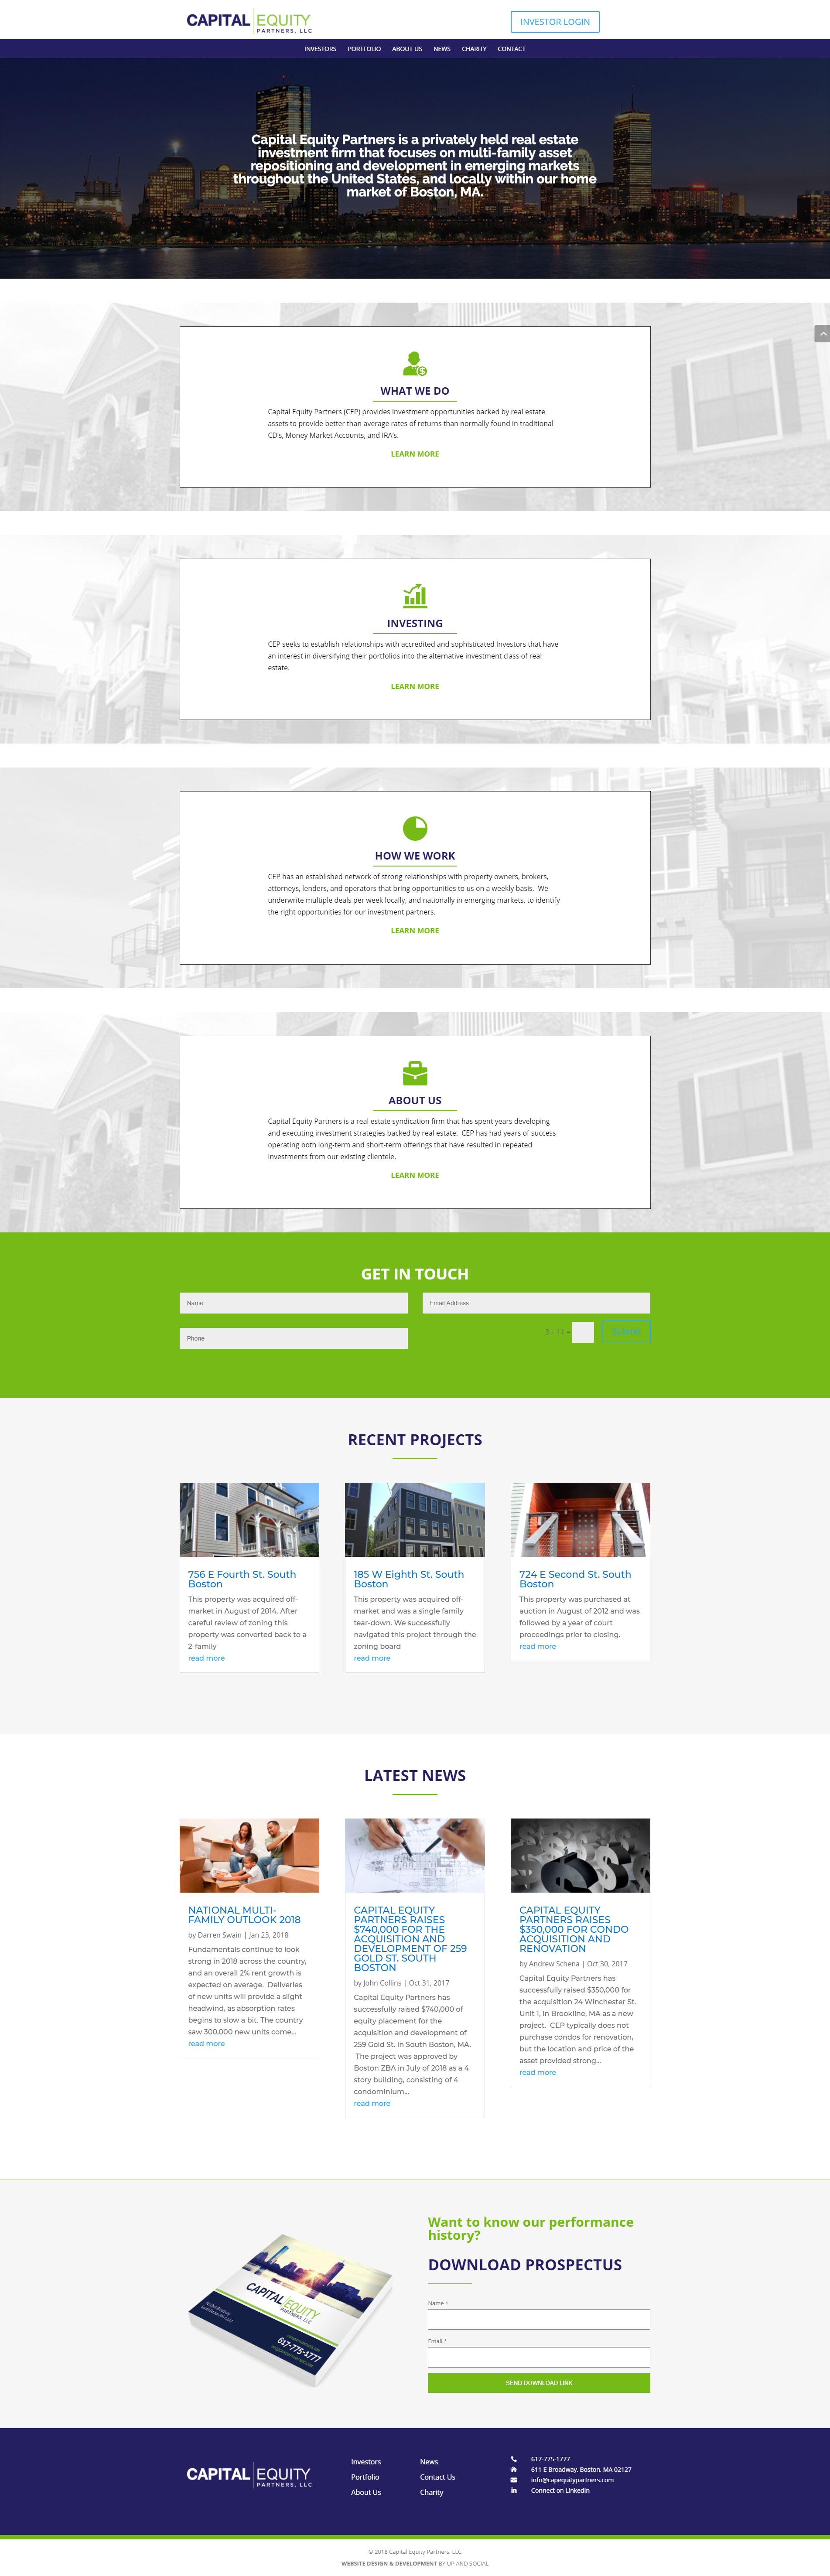 Investment Company Web Design